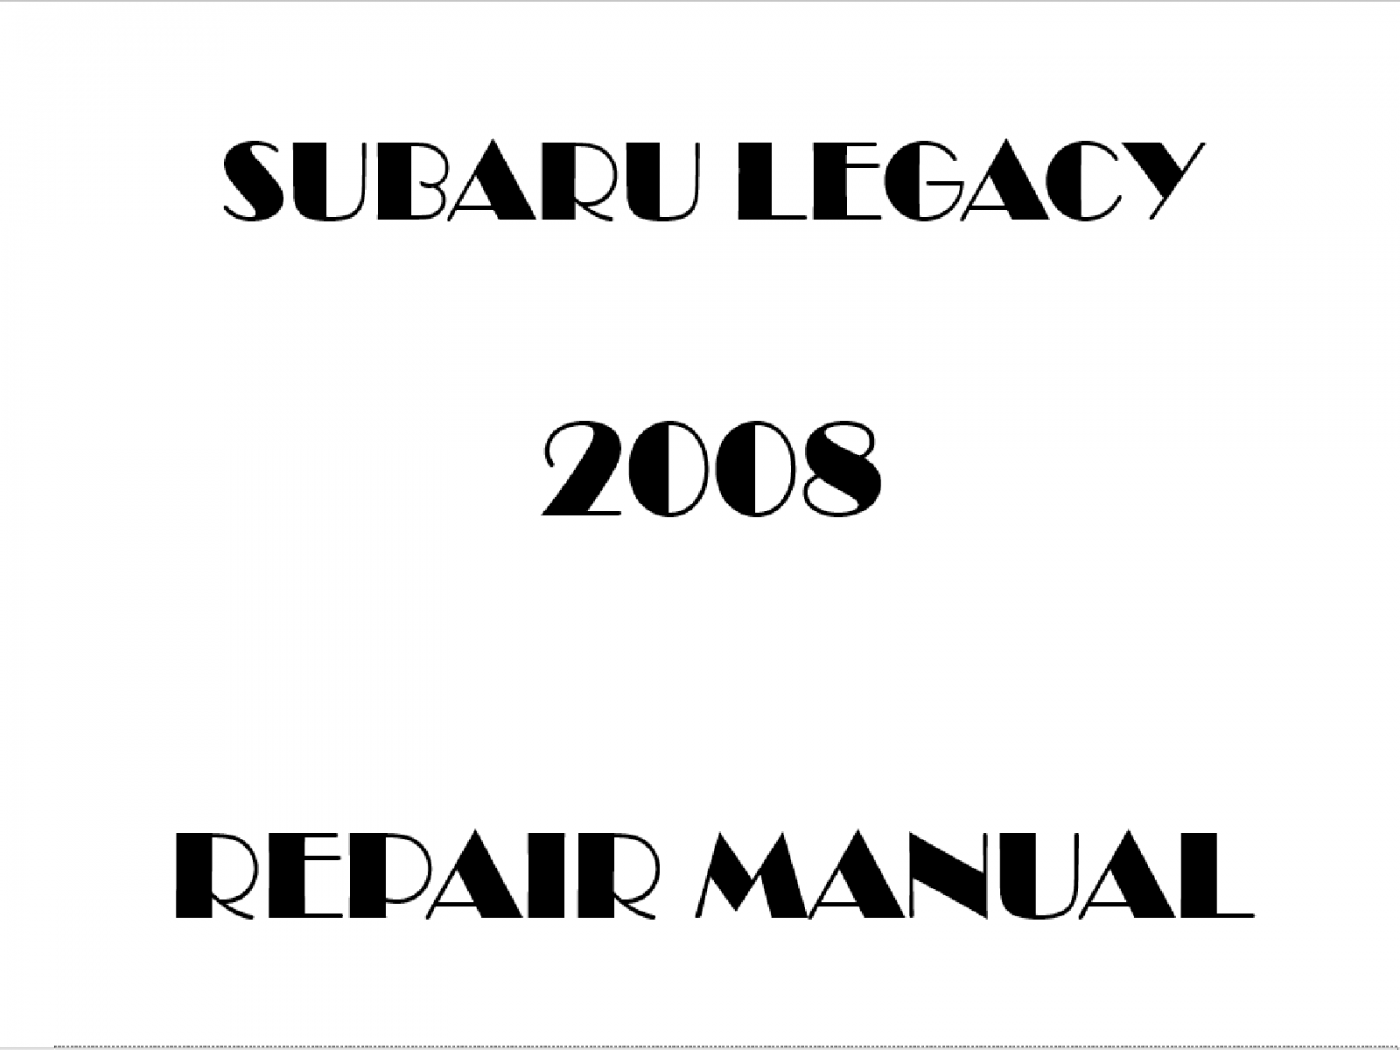 2008 Subaru Legacy repair manual